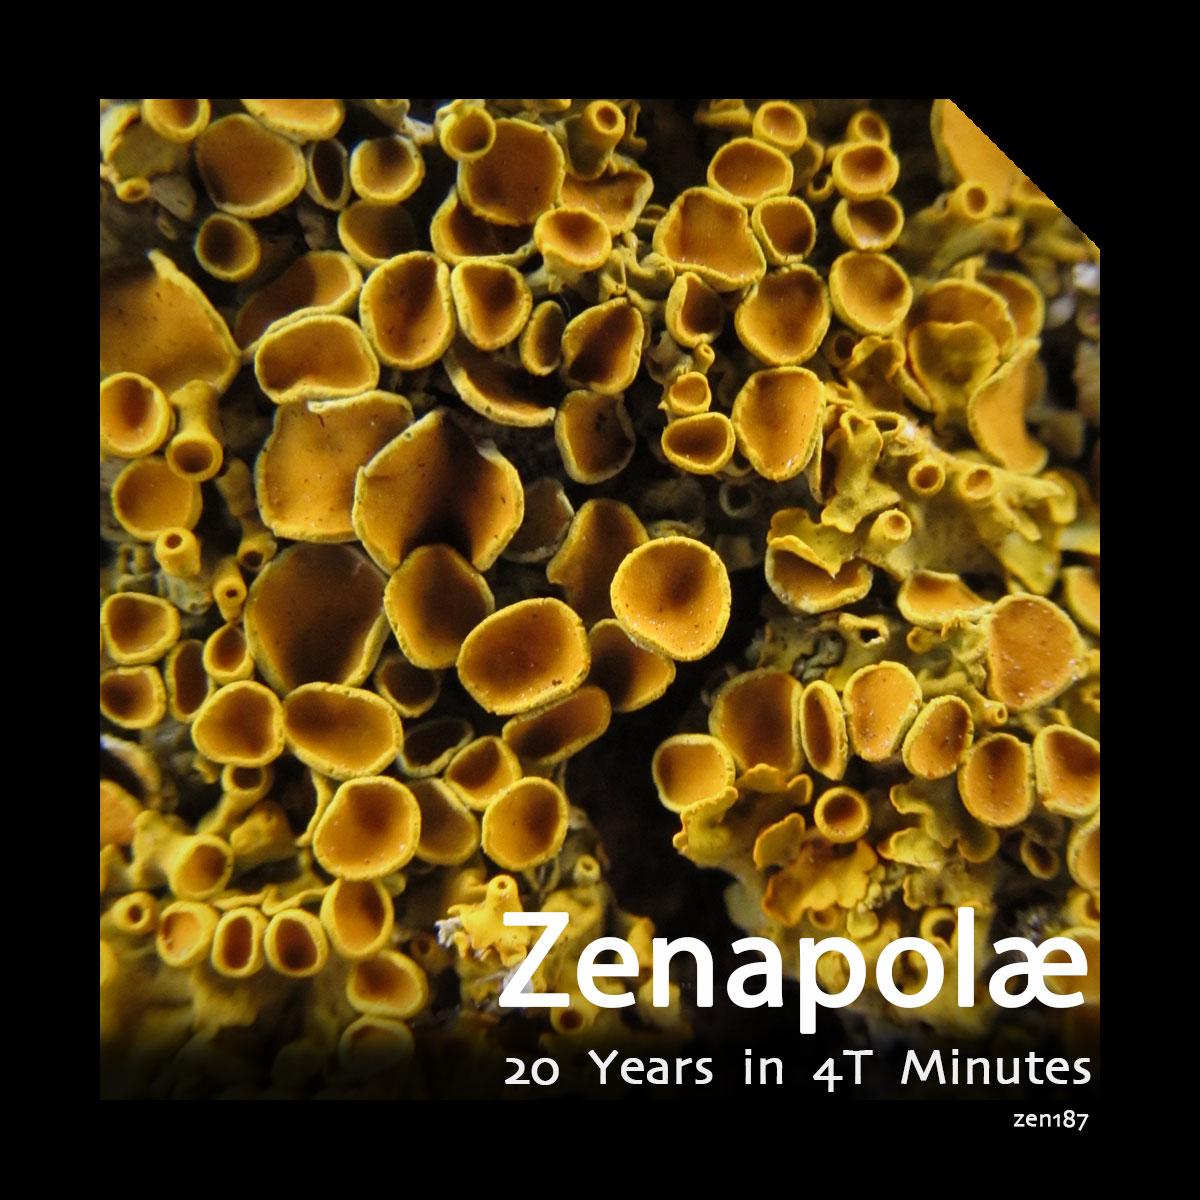 Zenapolæ – 20 Years in 4T Minutes